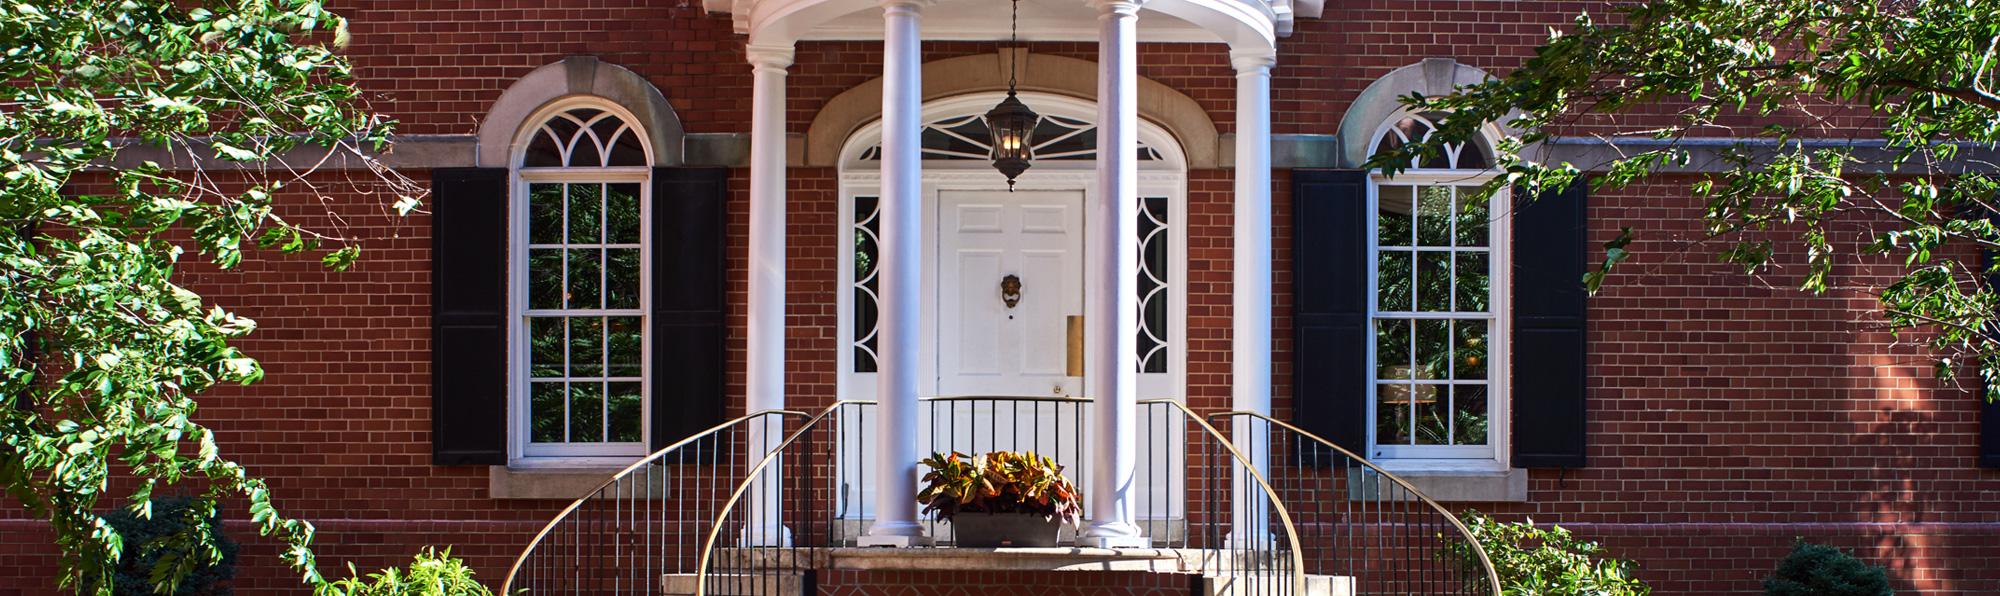 Morrison House, Boutique, Hotel, Alexandria, VA